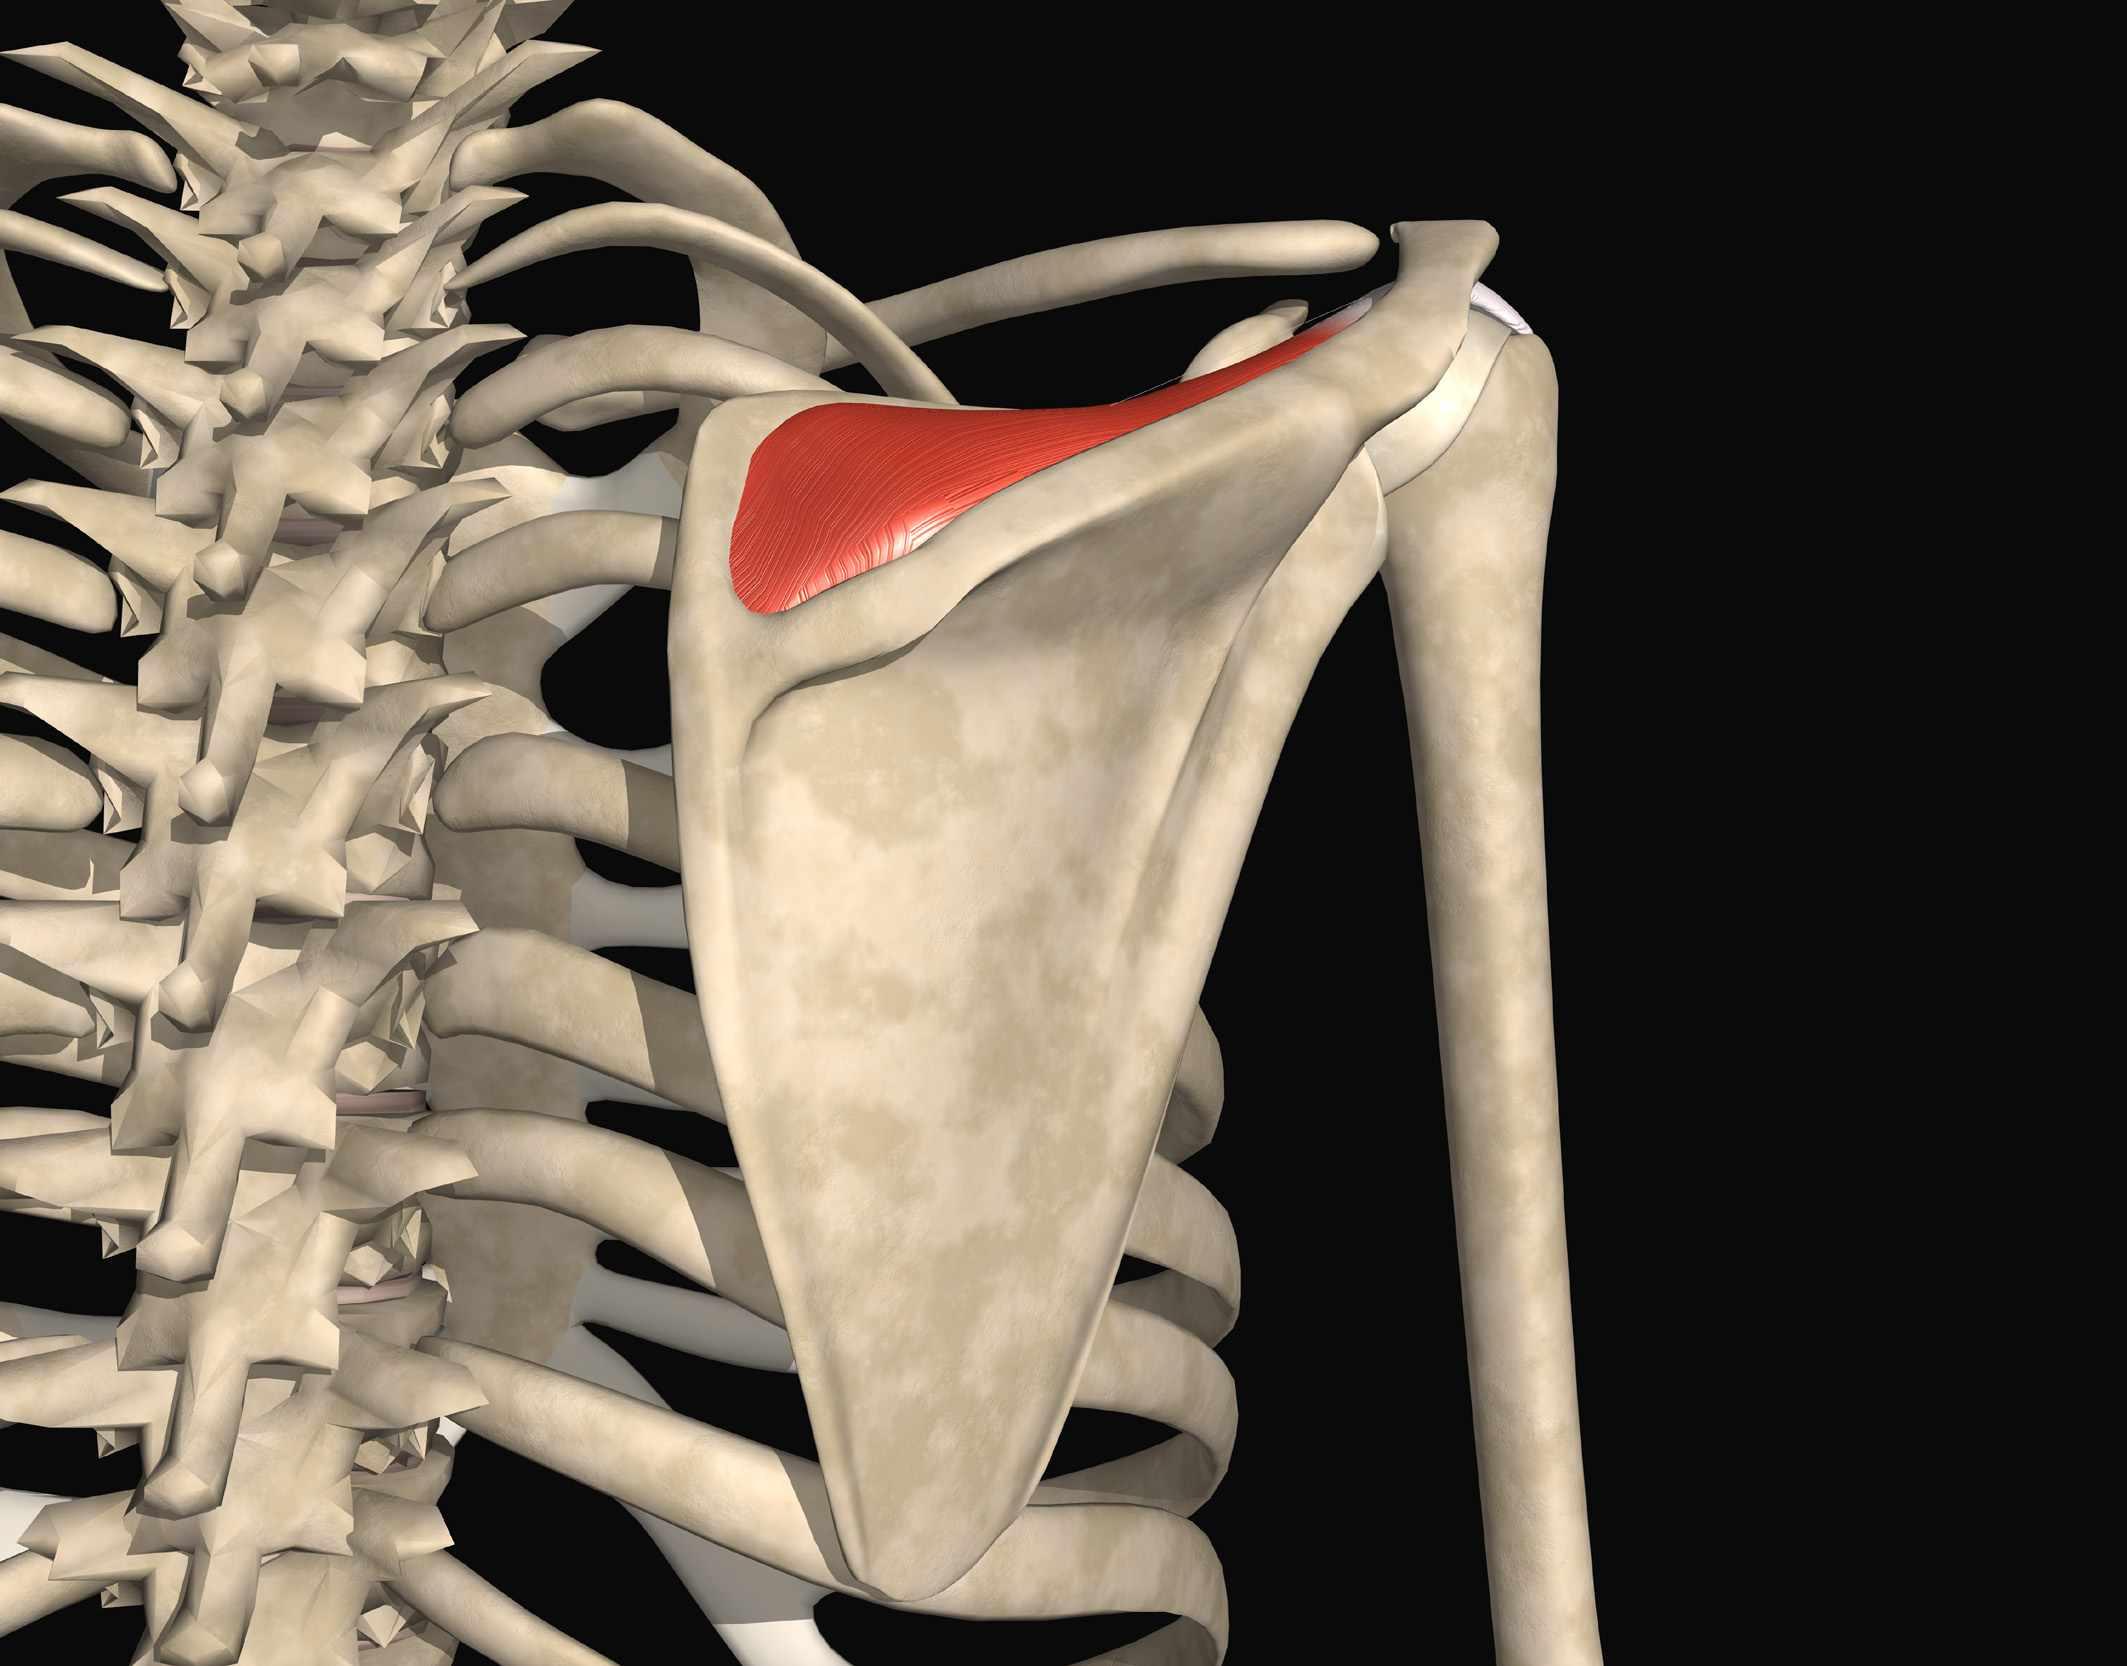 Rotator Cuff Muscles - Supraspinatus, Infraspinatus